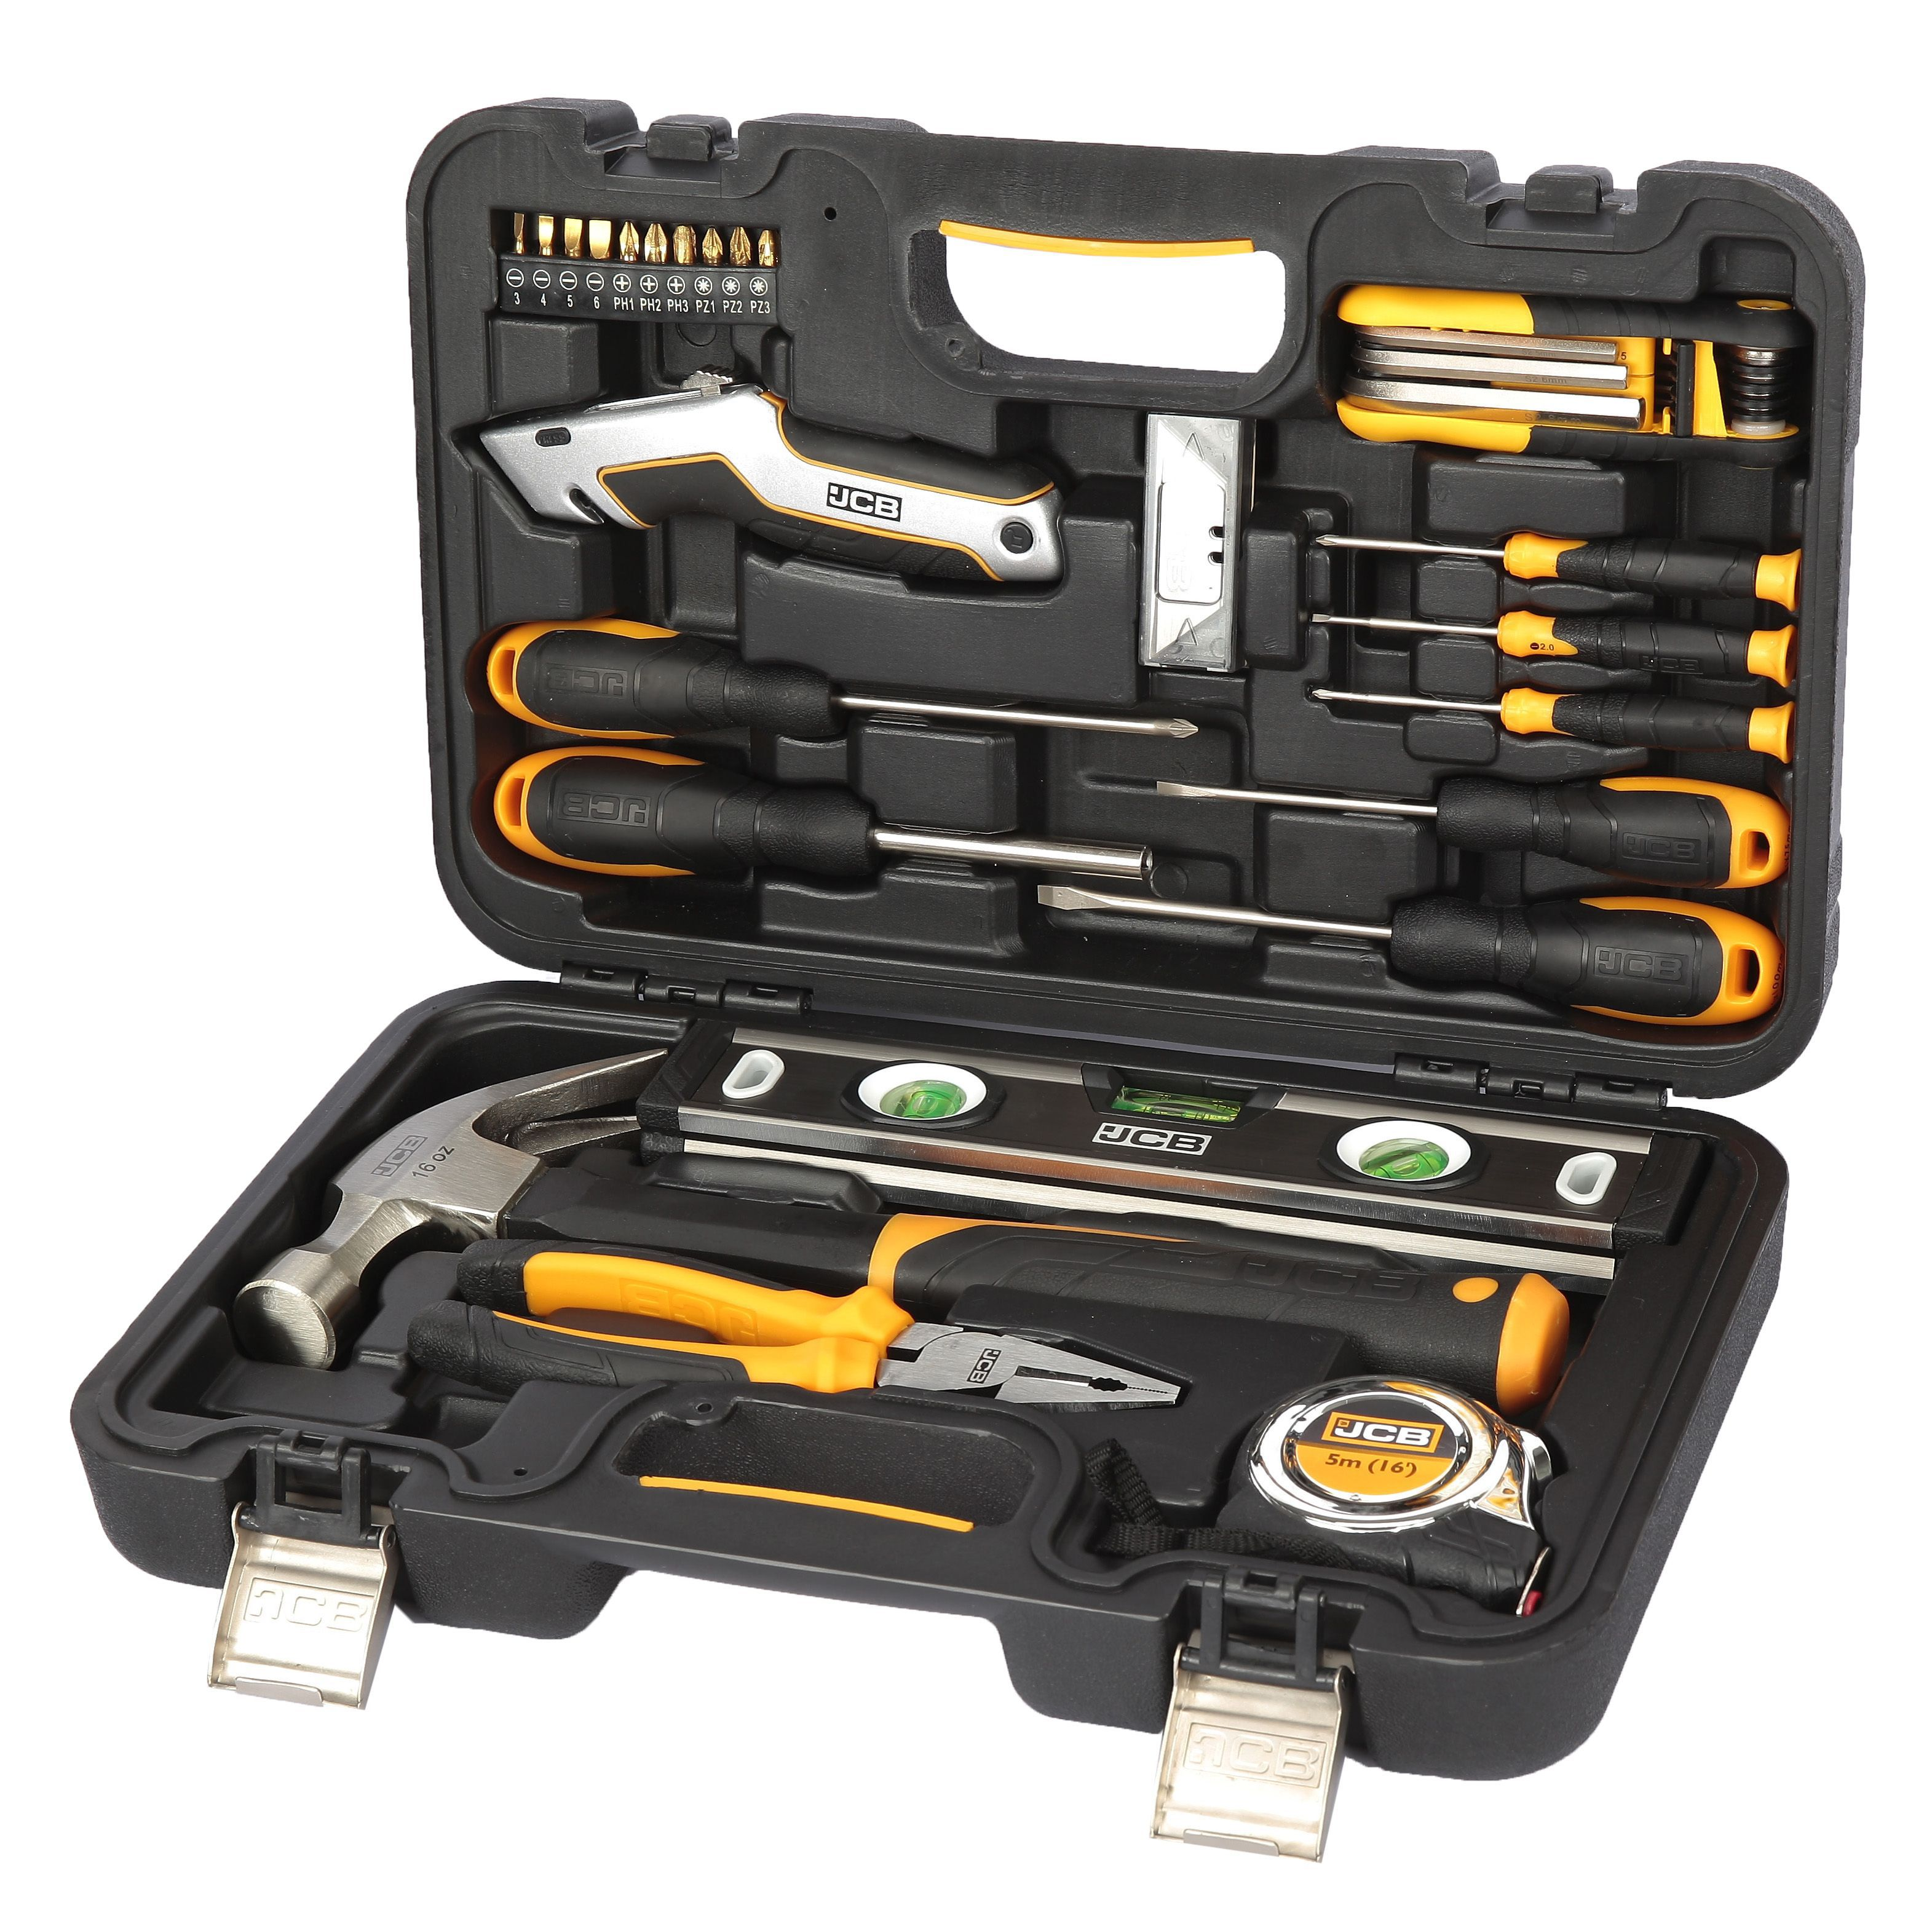 Jcb 30 Piece Heavy Duty Tool Kit Departments Diy At B Amp Q